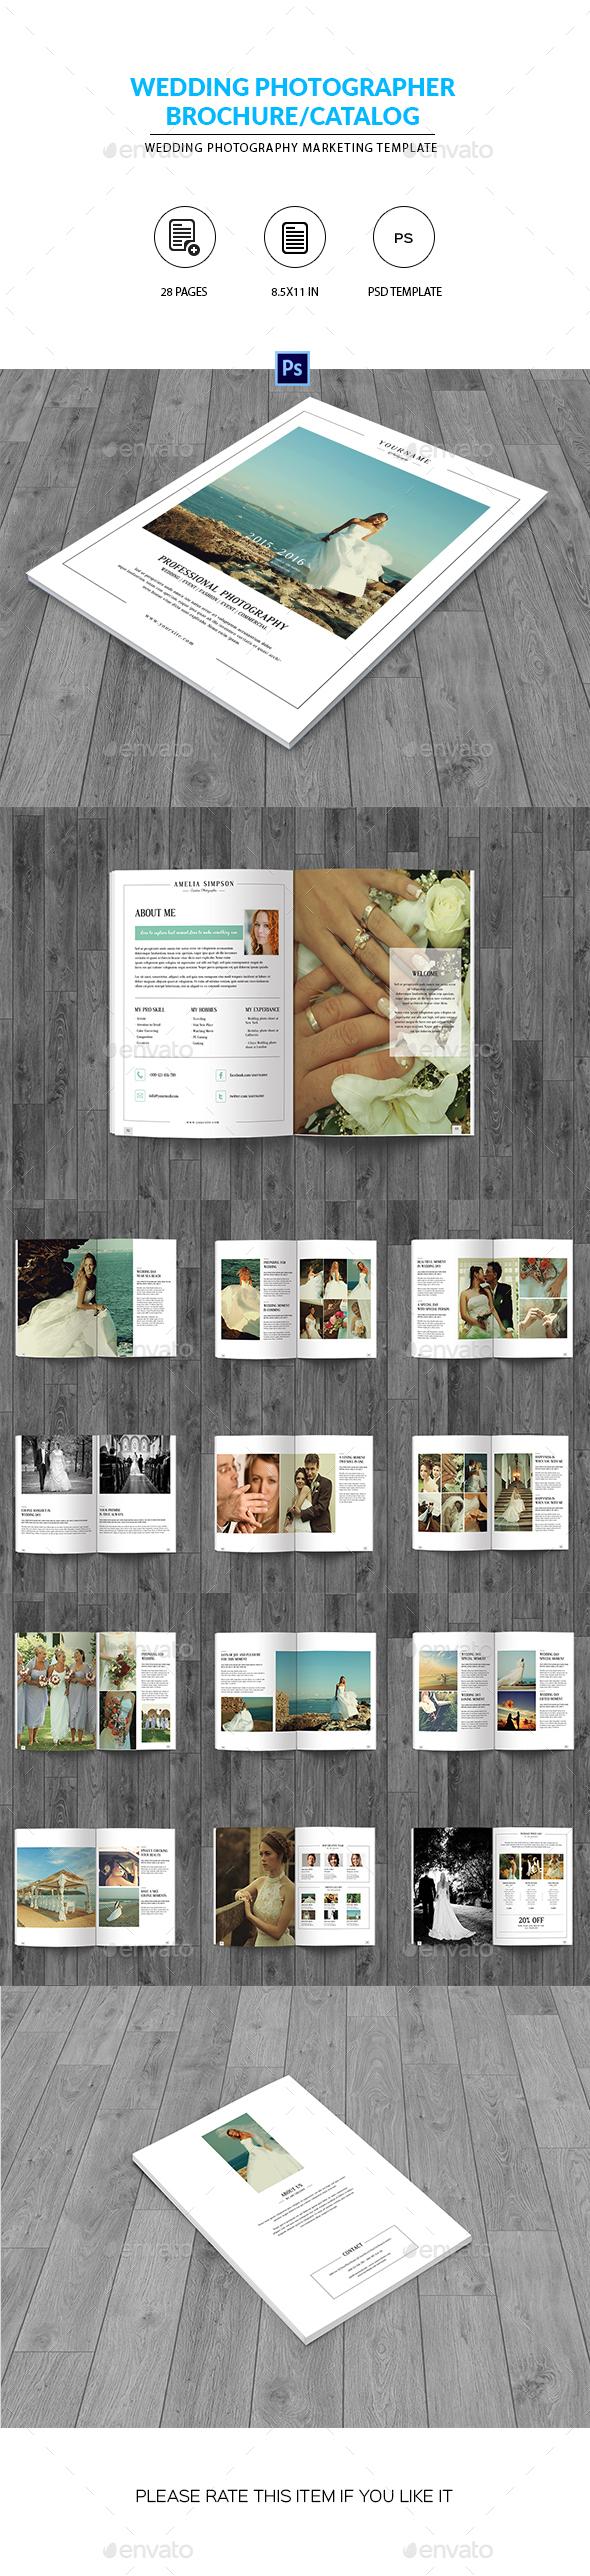 Wedding Photography Brochure/Catalog - Catalogs Brochures